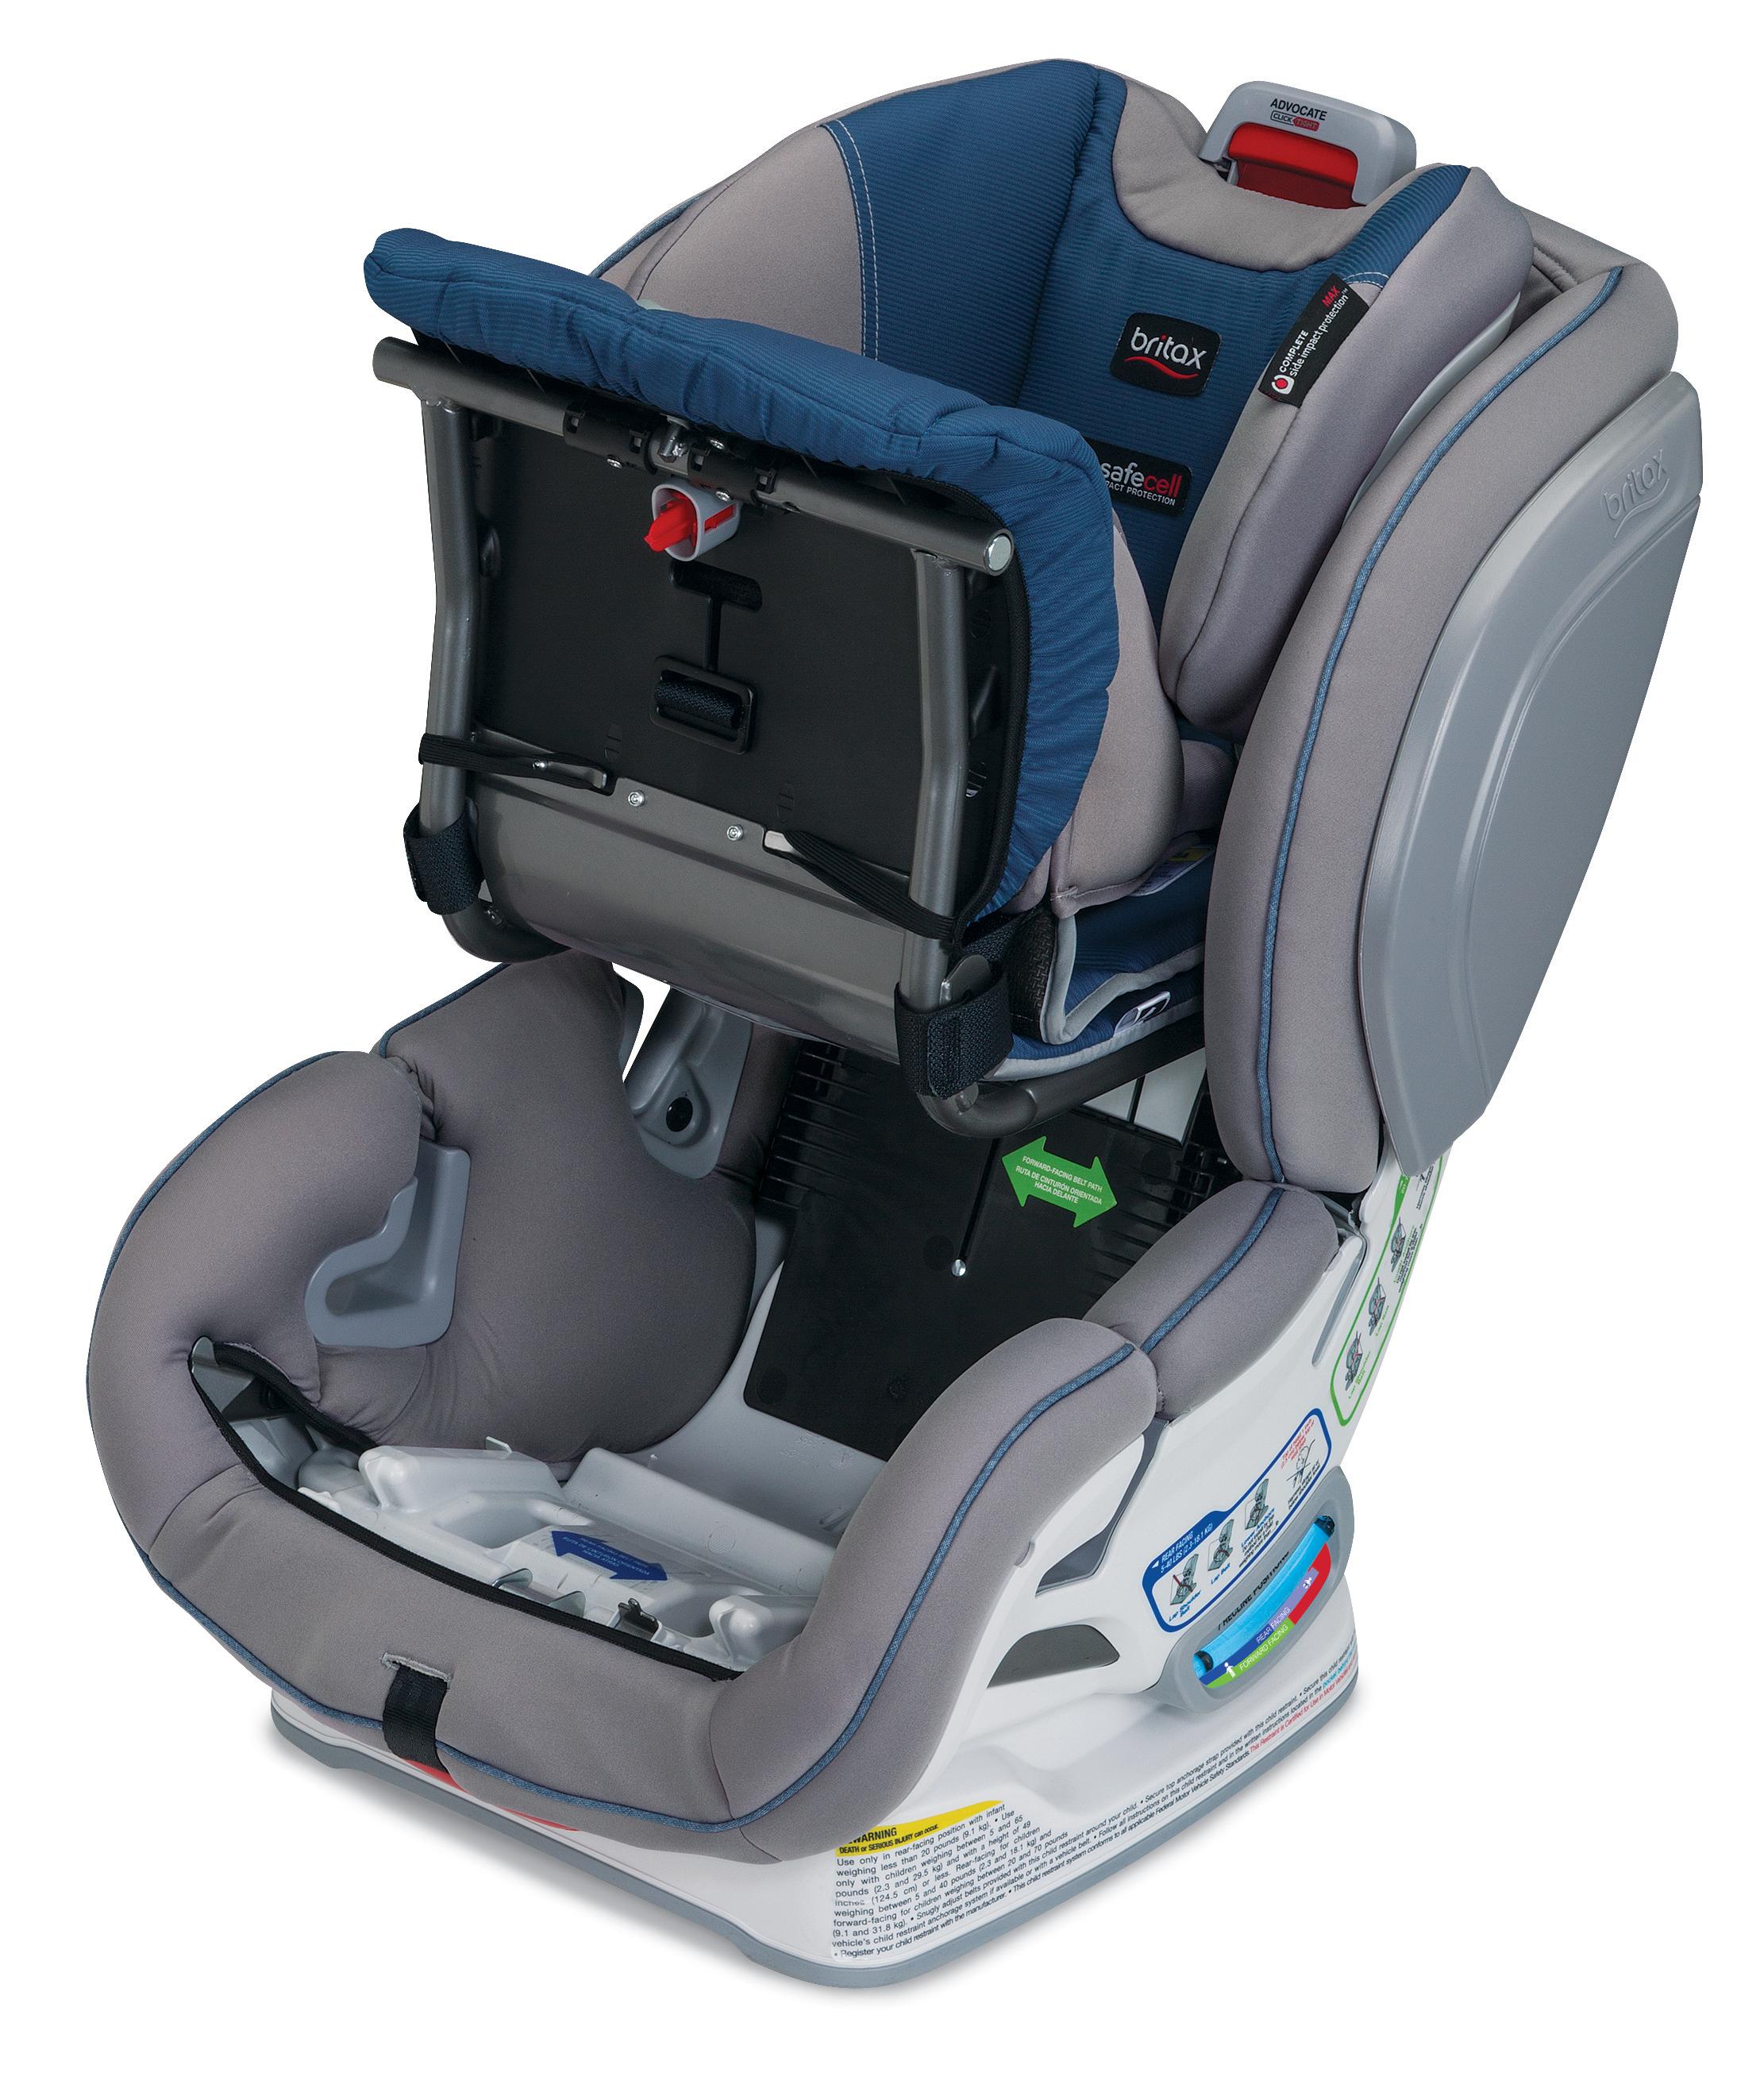 Britax Advocate Car Seat Reviews